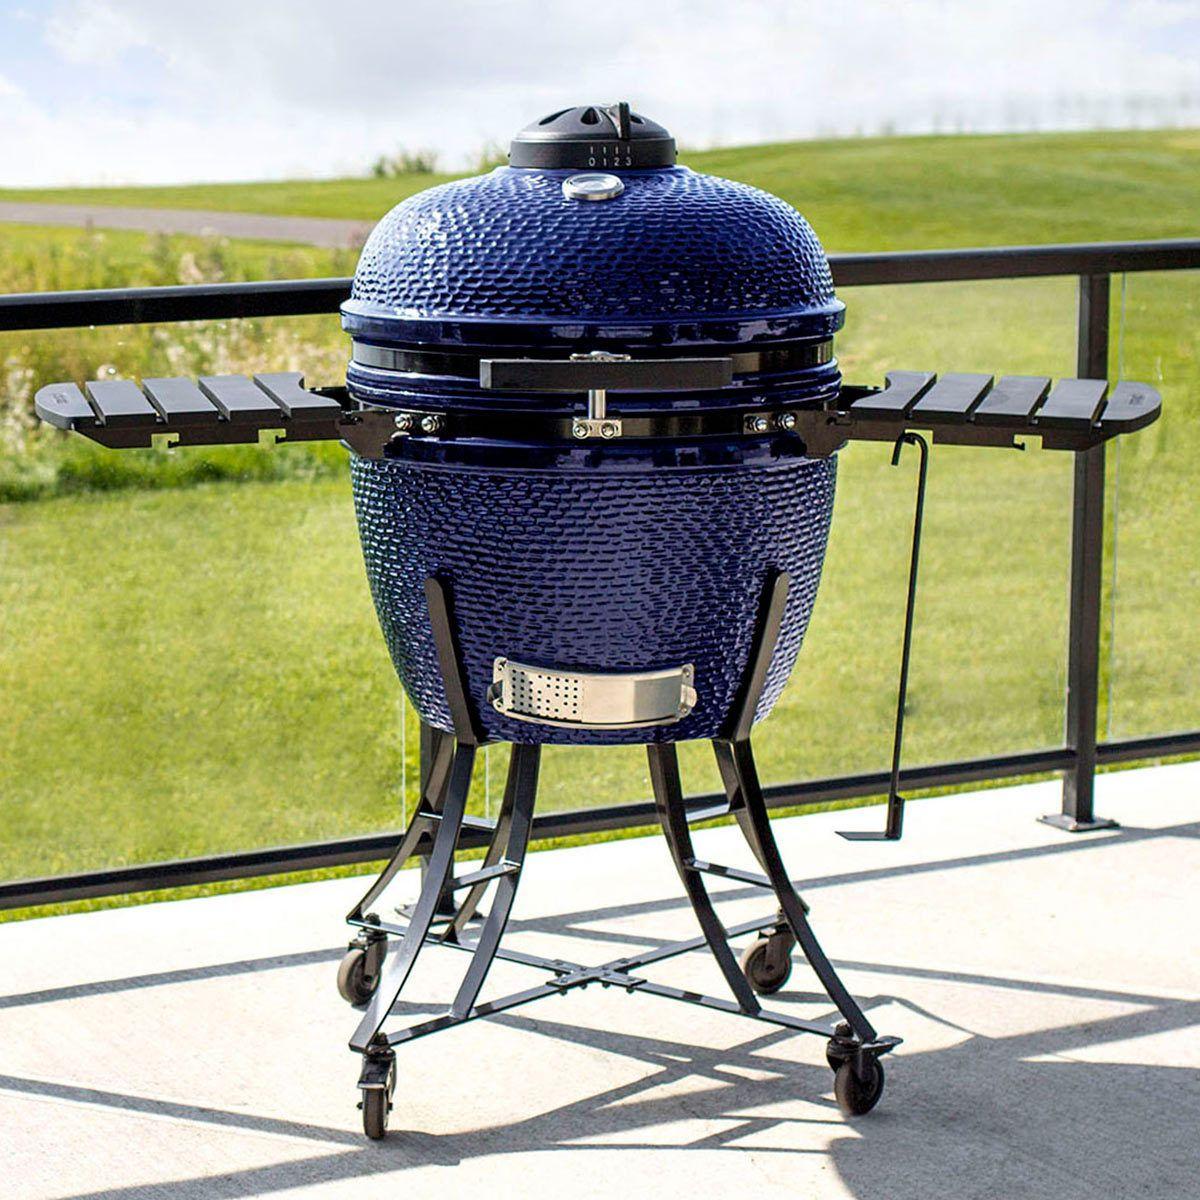 Louisiana Grills 24 (60 cm) Ceramic Kamado Charcoal Barbecue - In 3